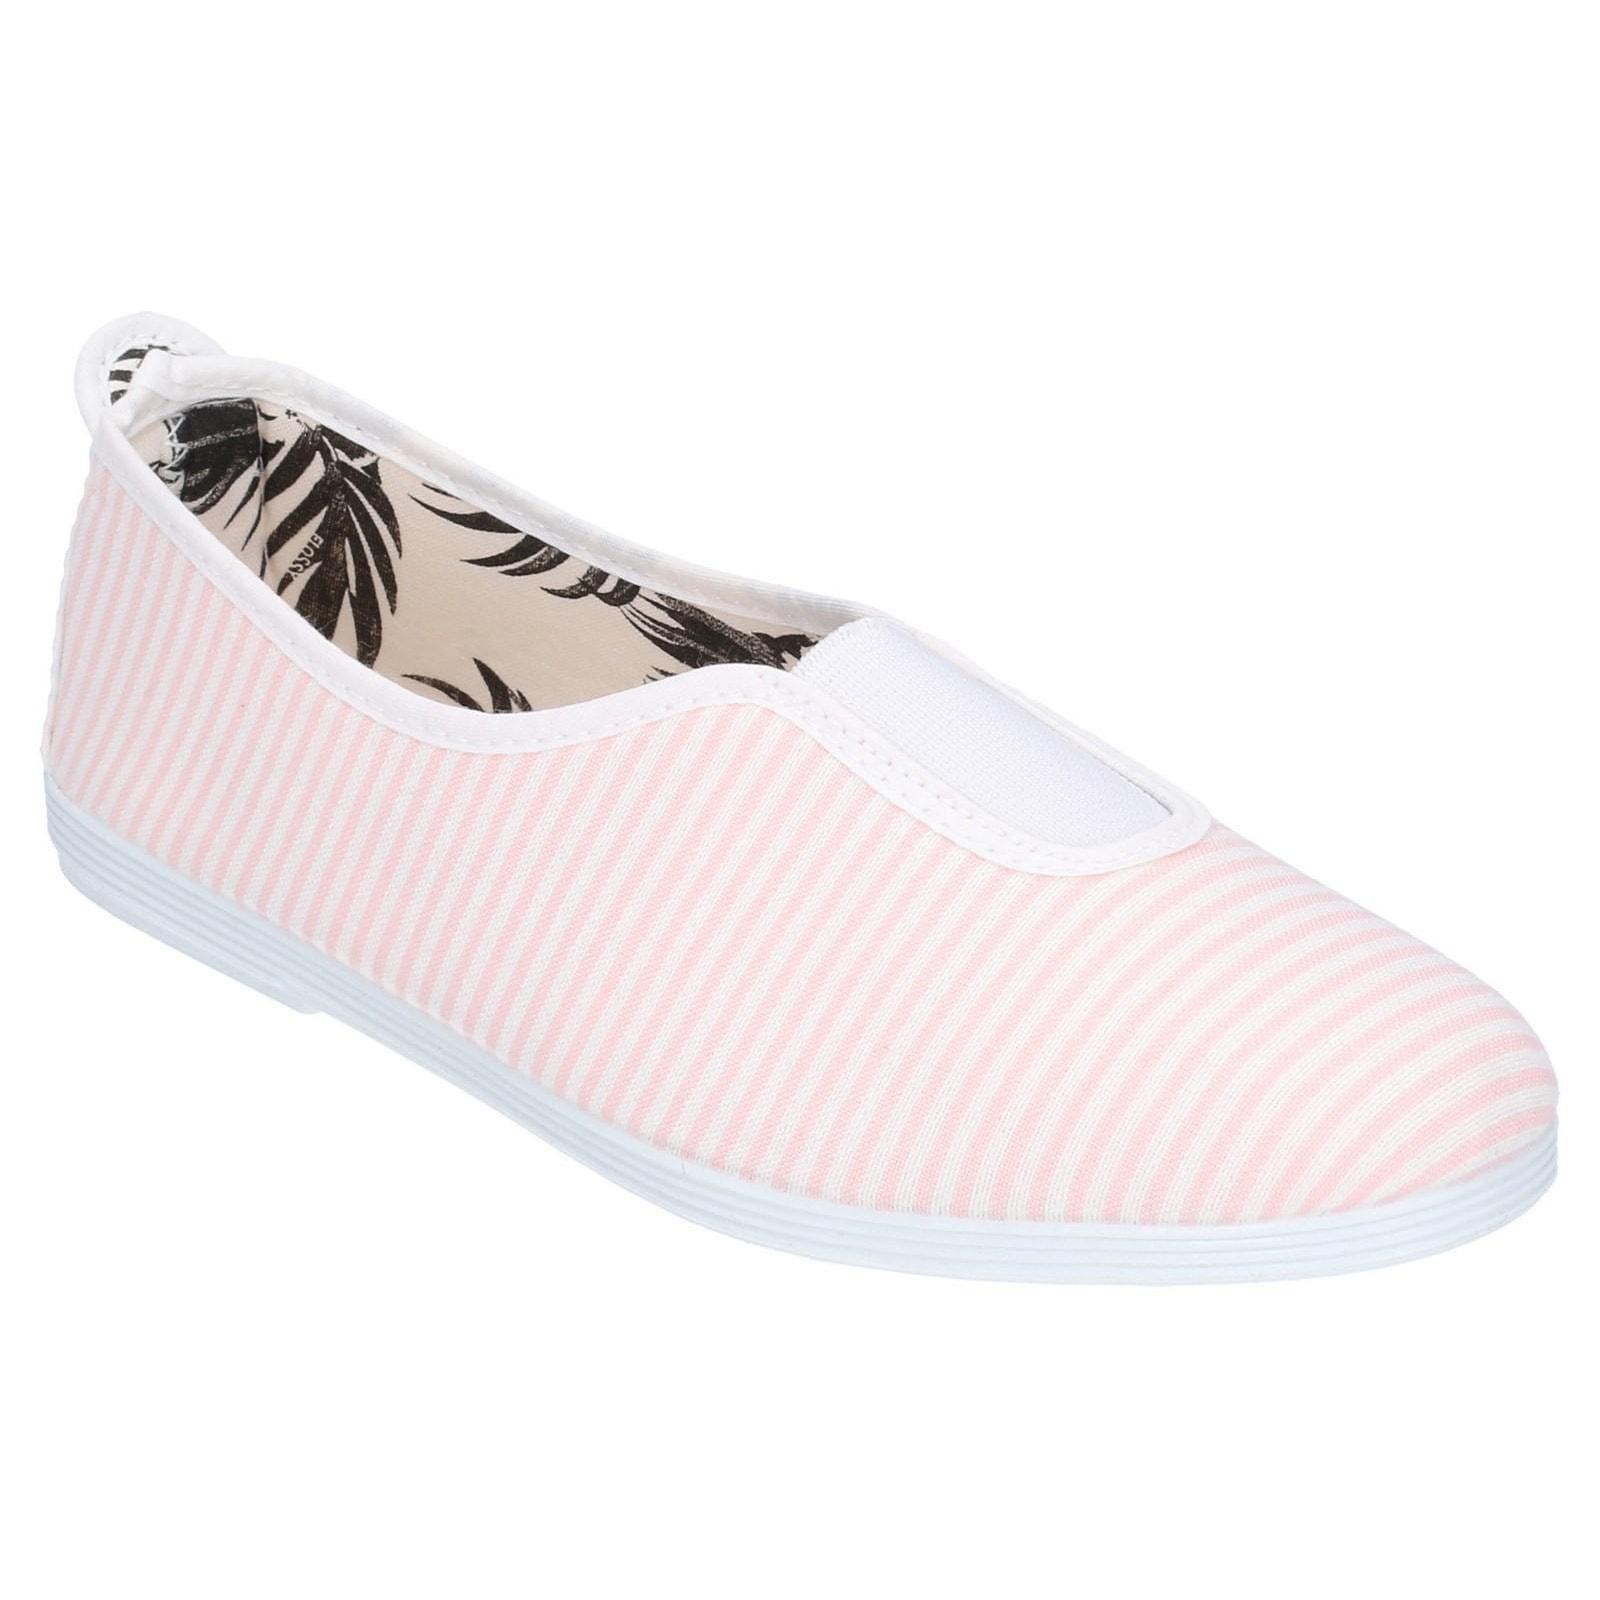 flossy -  Slipper Damen Rayuela Slip On Schuh